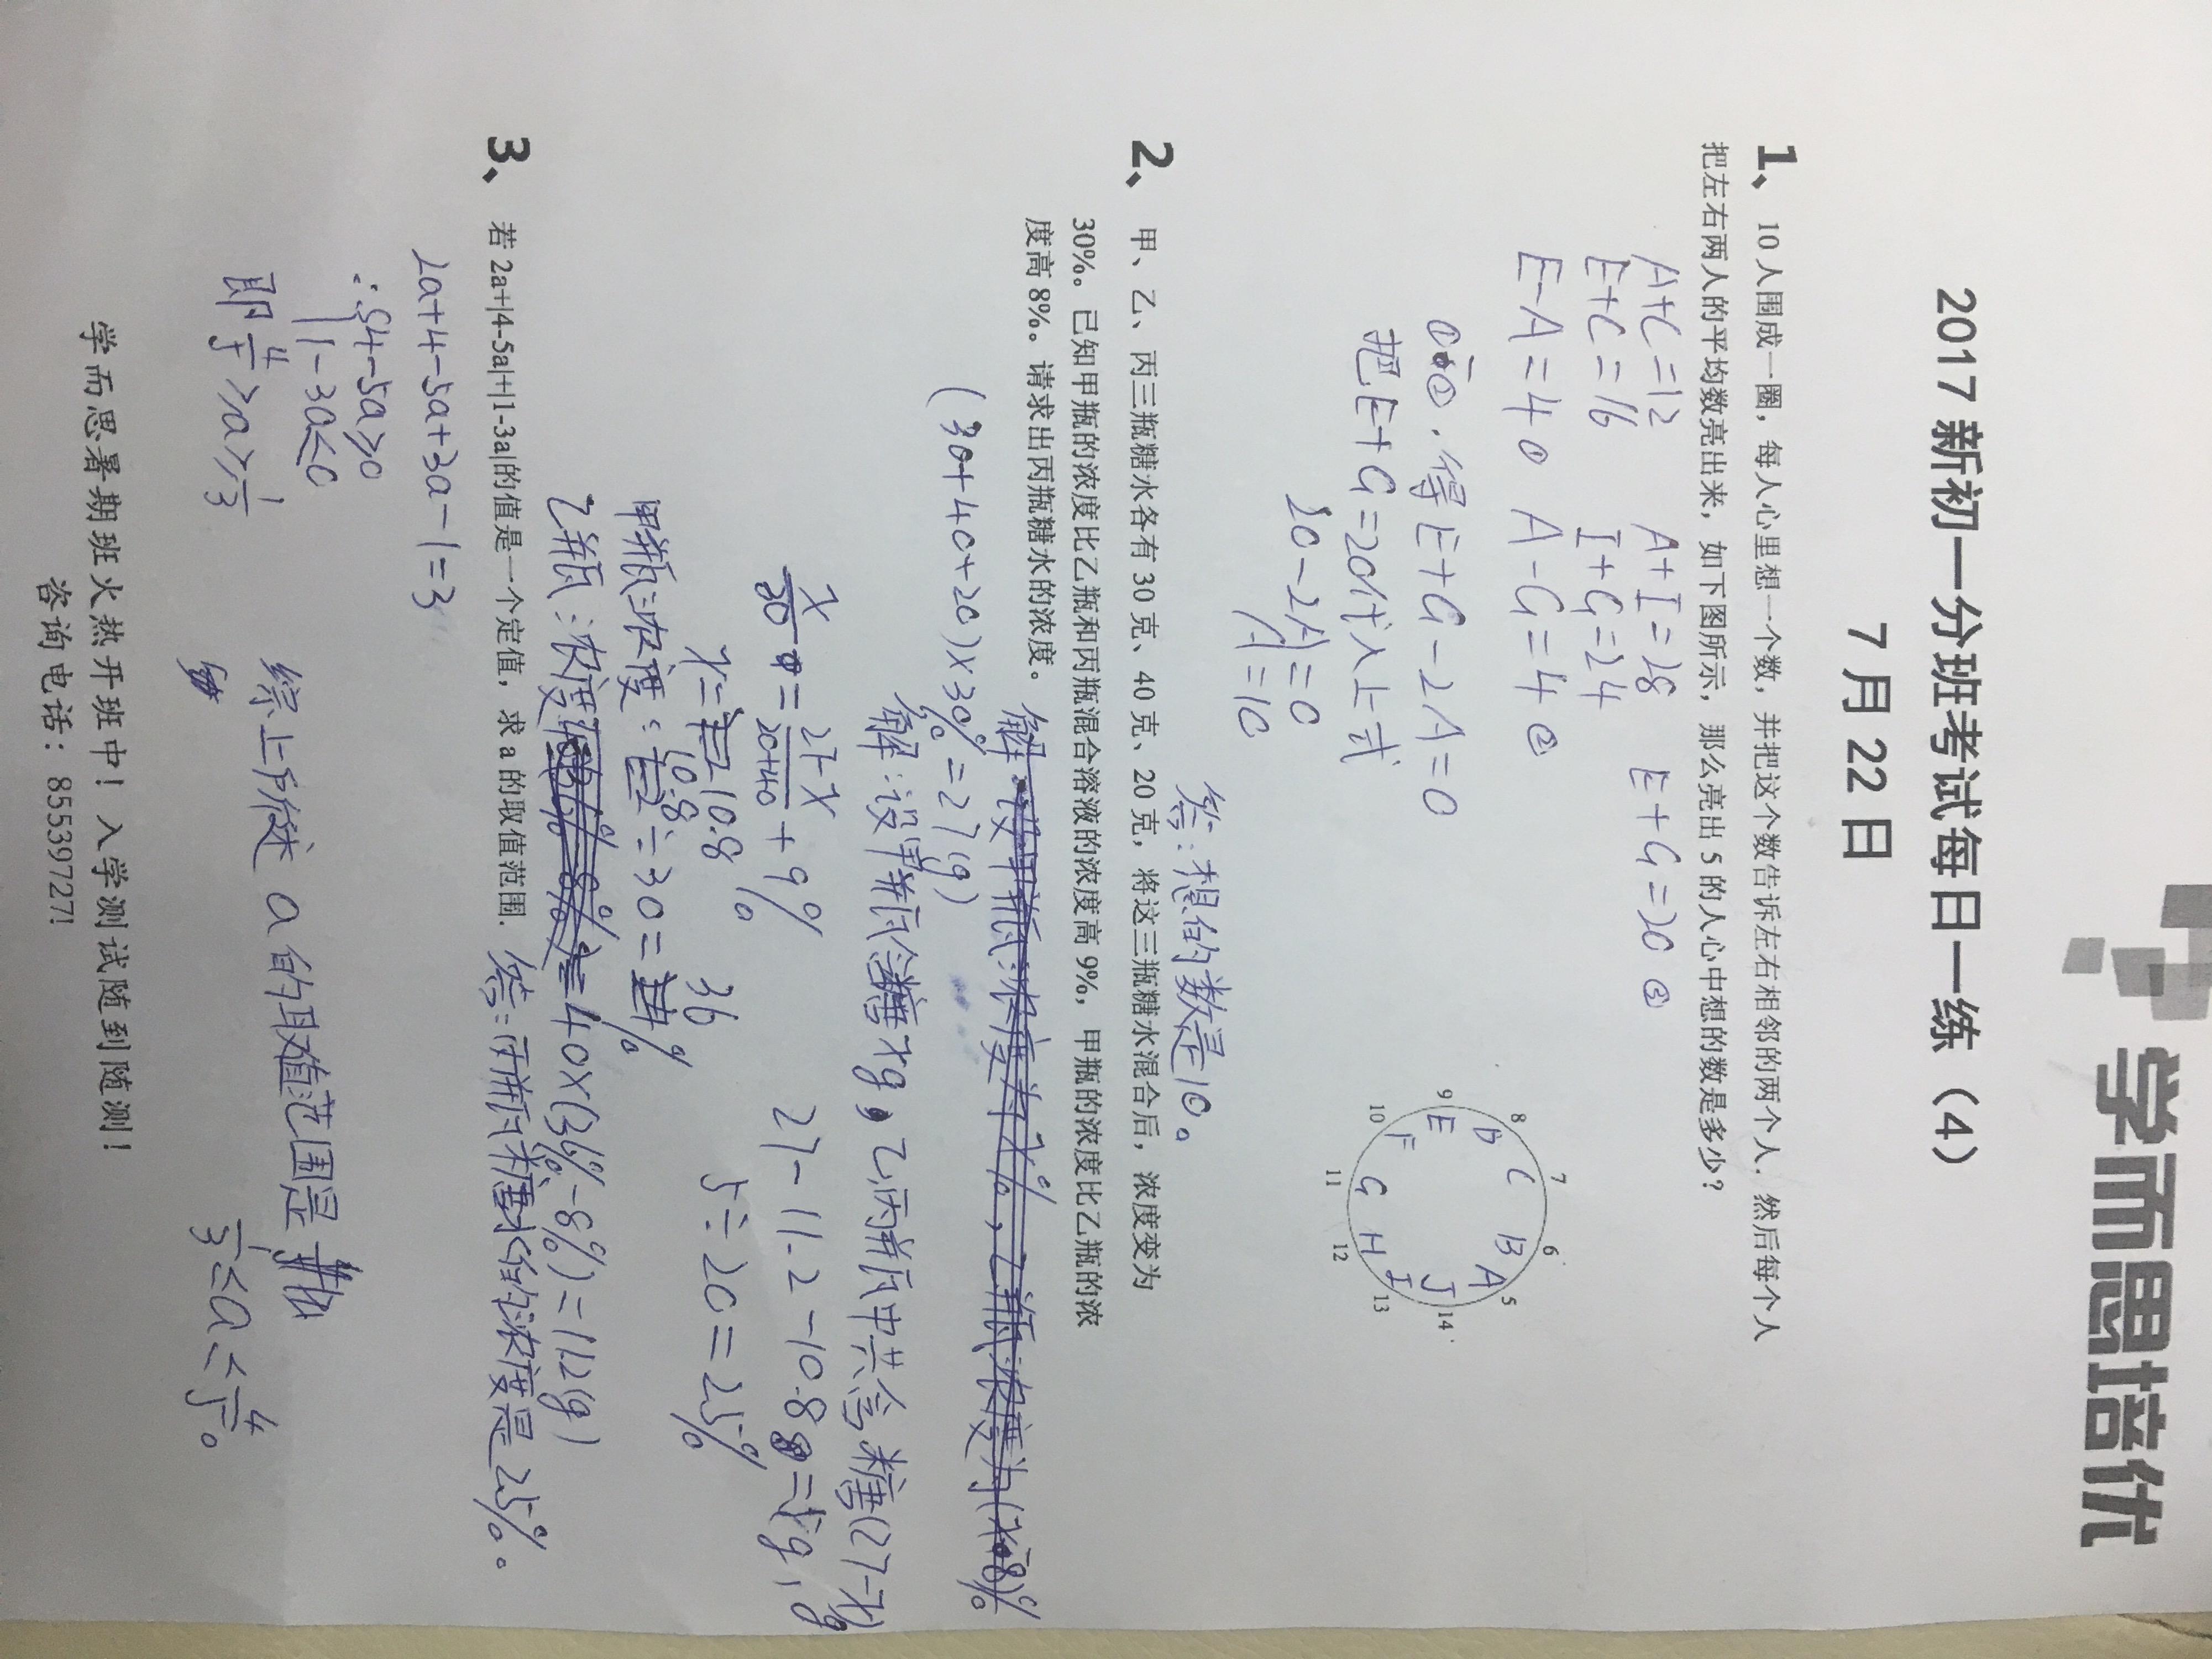 0EDDF221-8023-4517-B3BF-67DC96F755AB.jpg